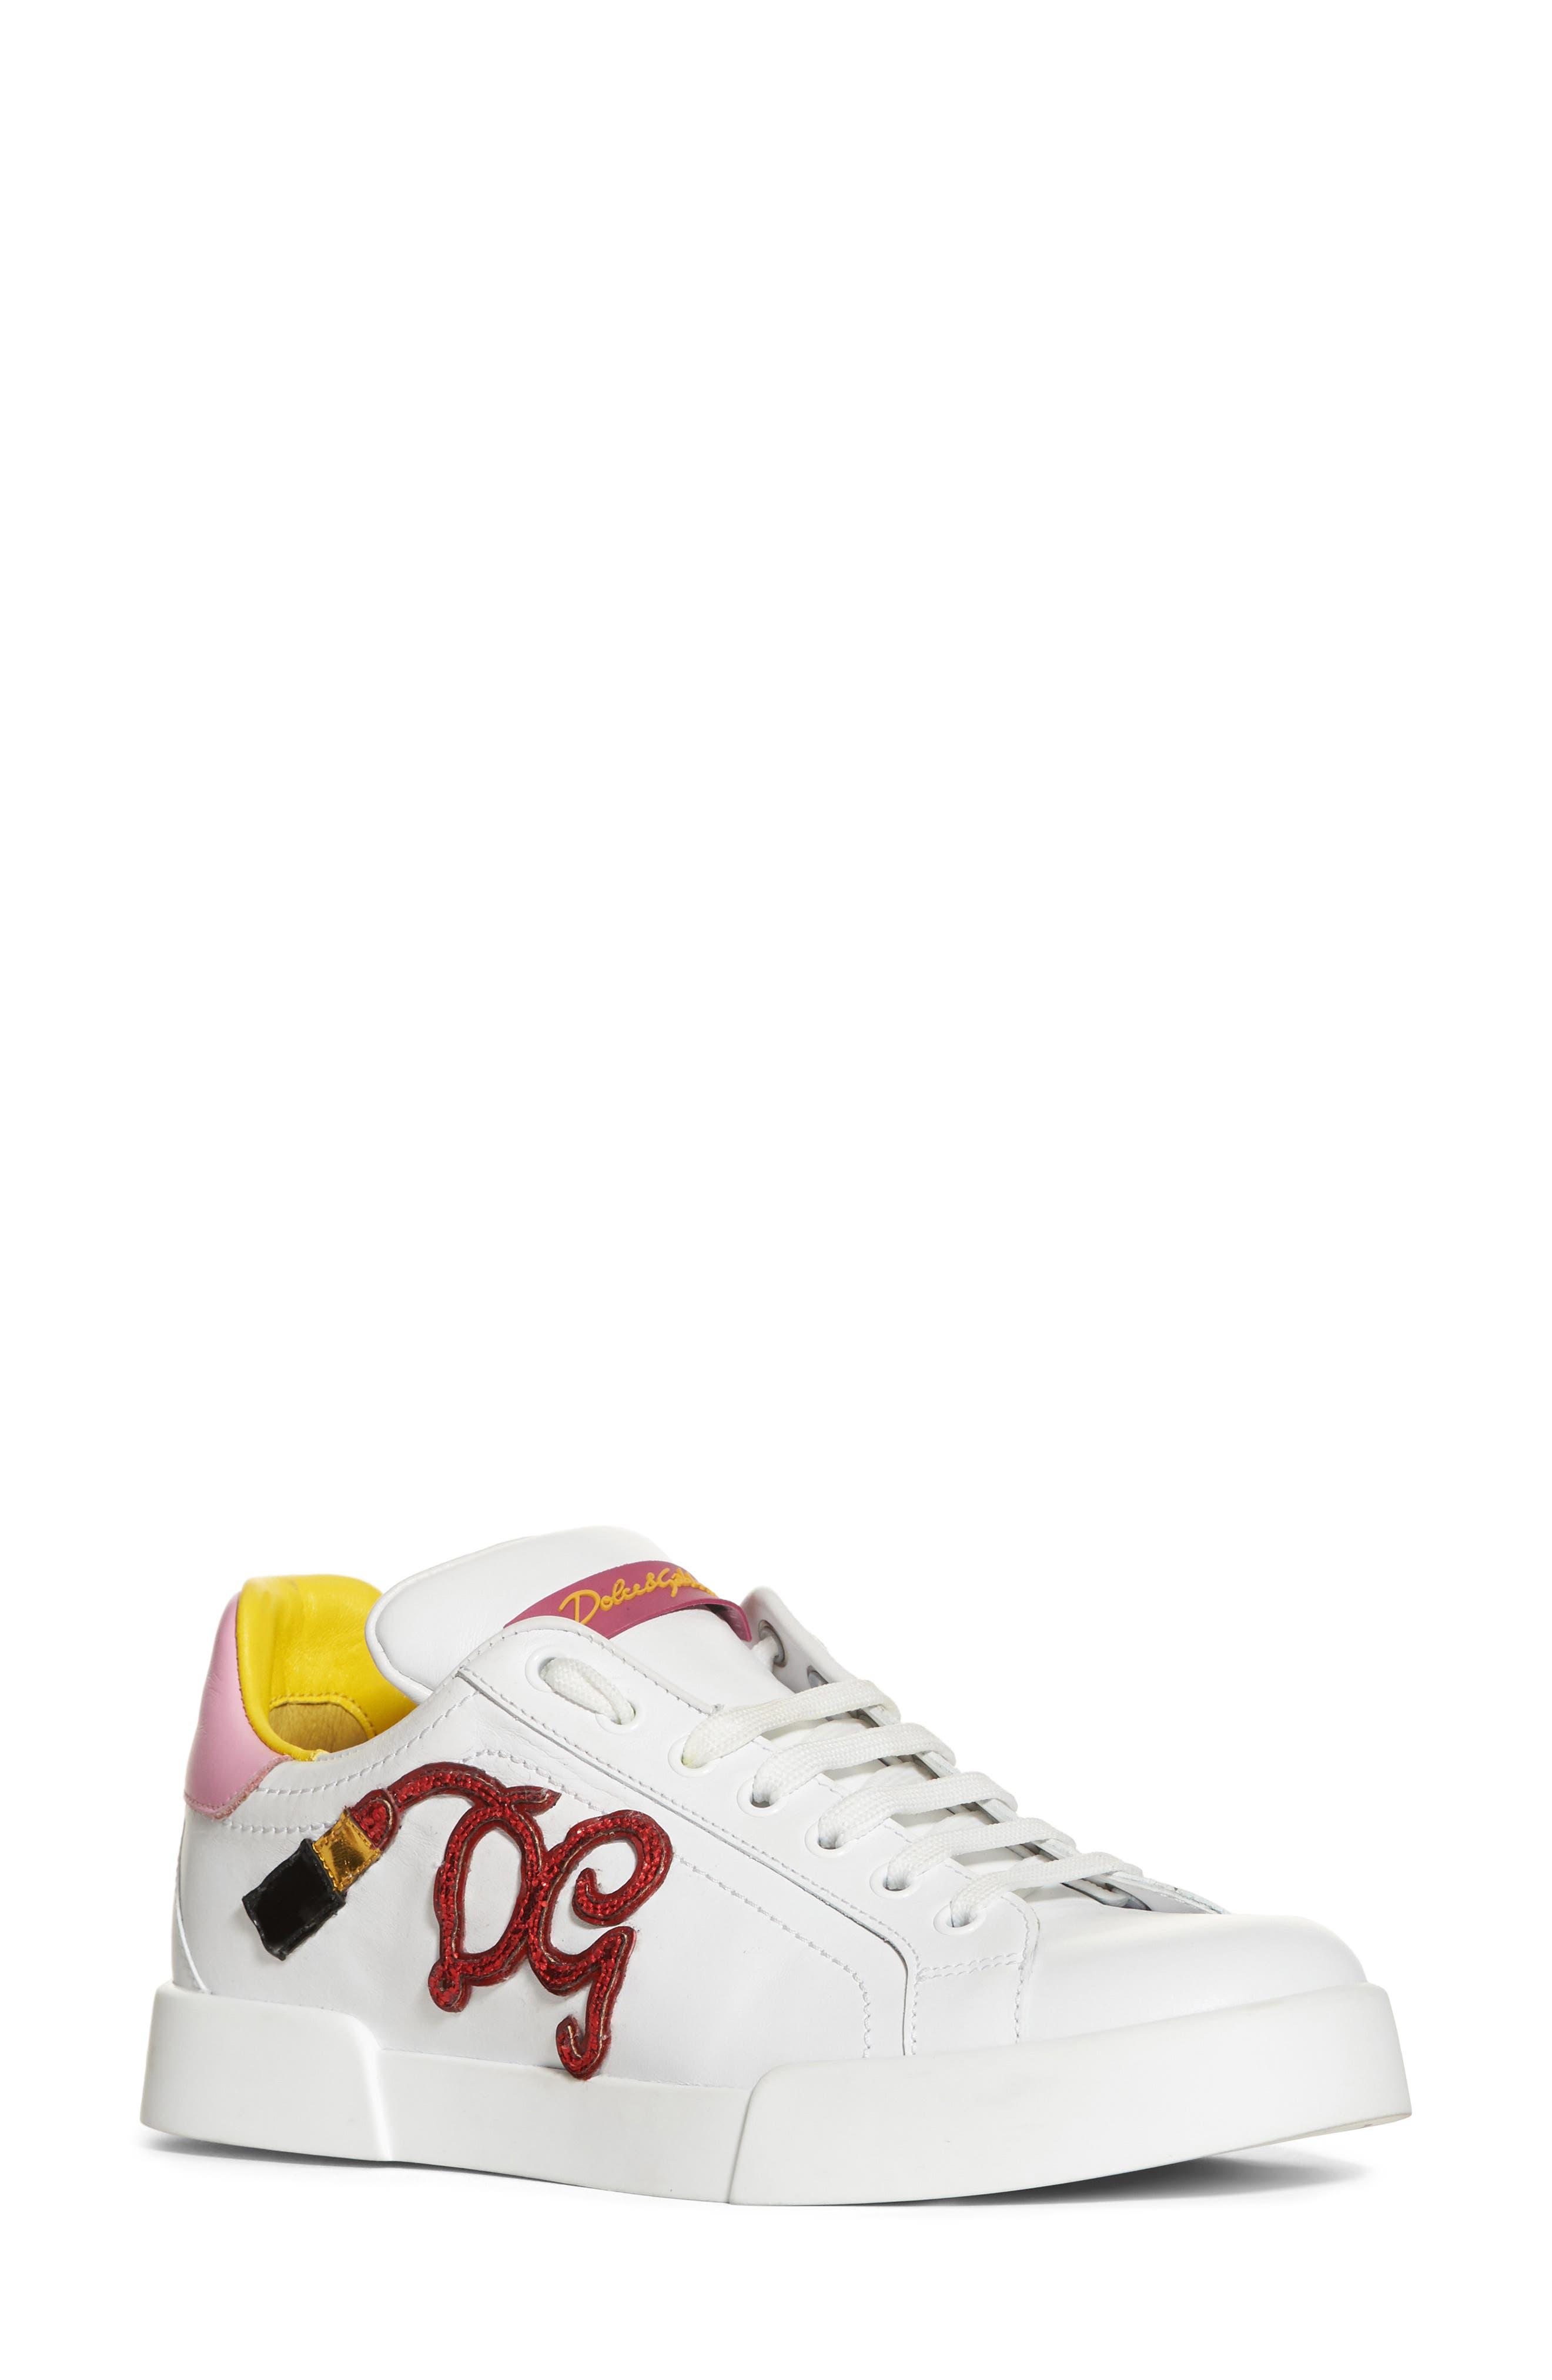 DOLCE&GABBANA Lipstick Sneaker